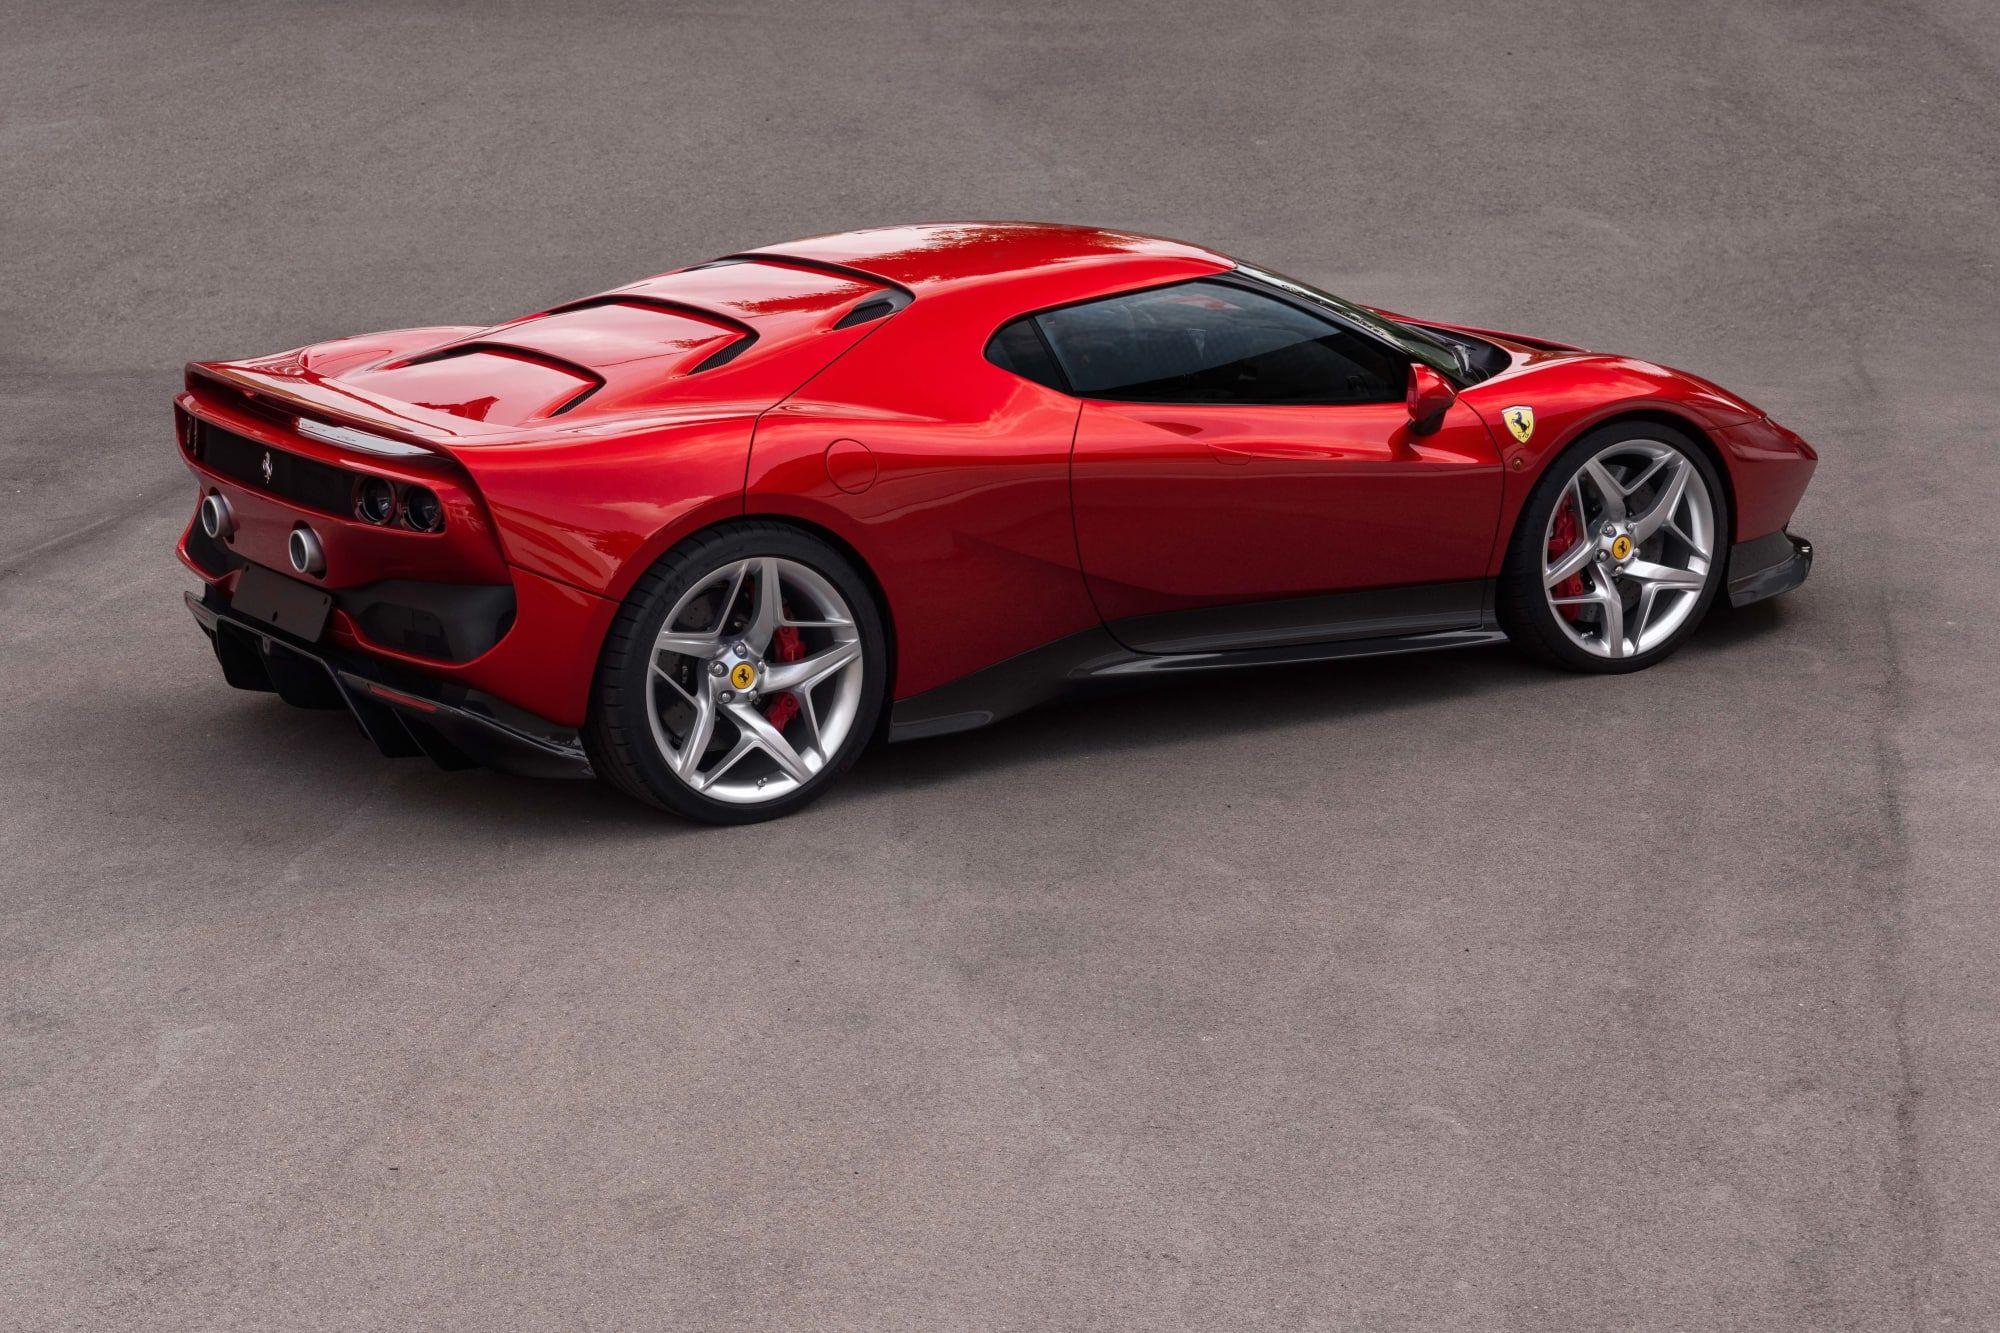 Ferrari Builds An F40 Inspired One Off For A Very Lucky Customer Ferrari Super Cars Sports Car